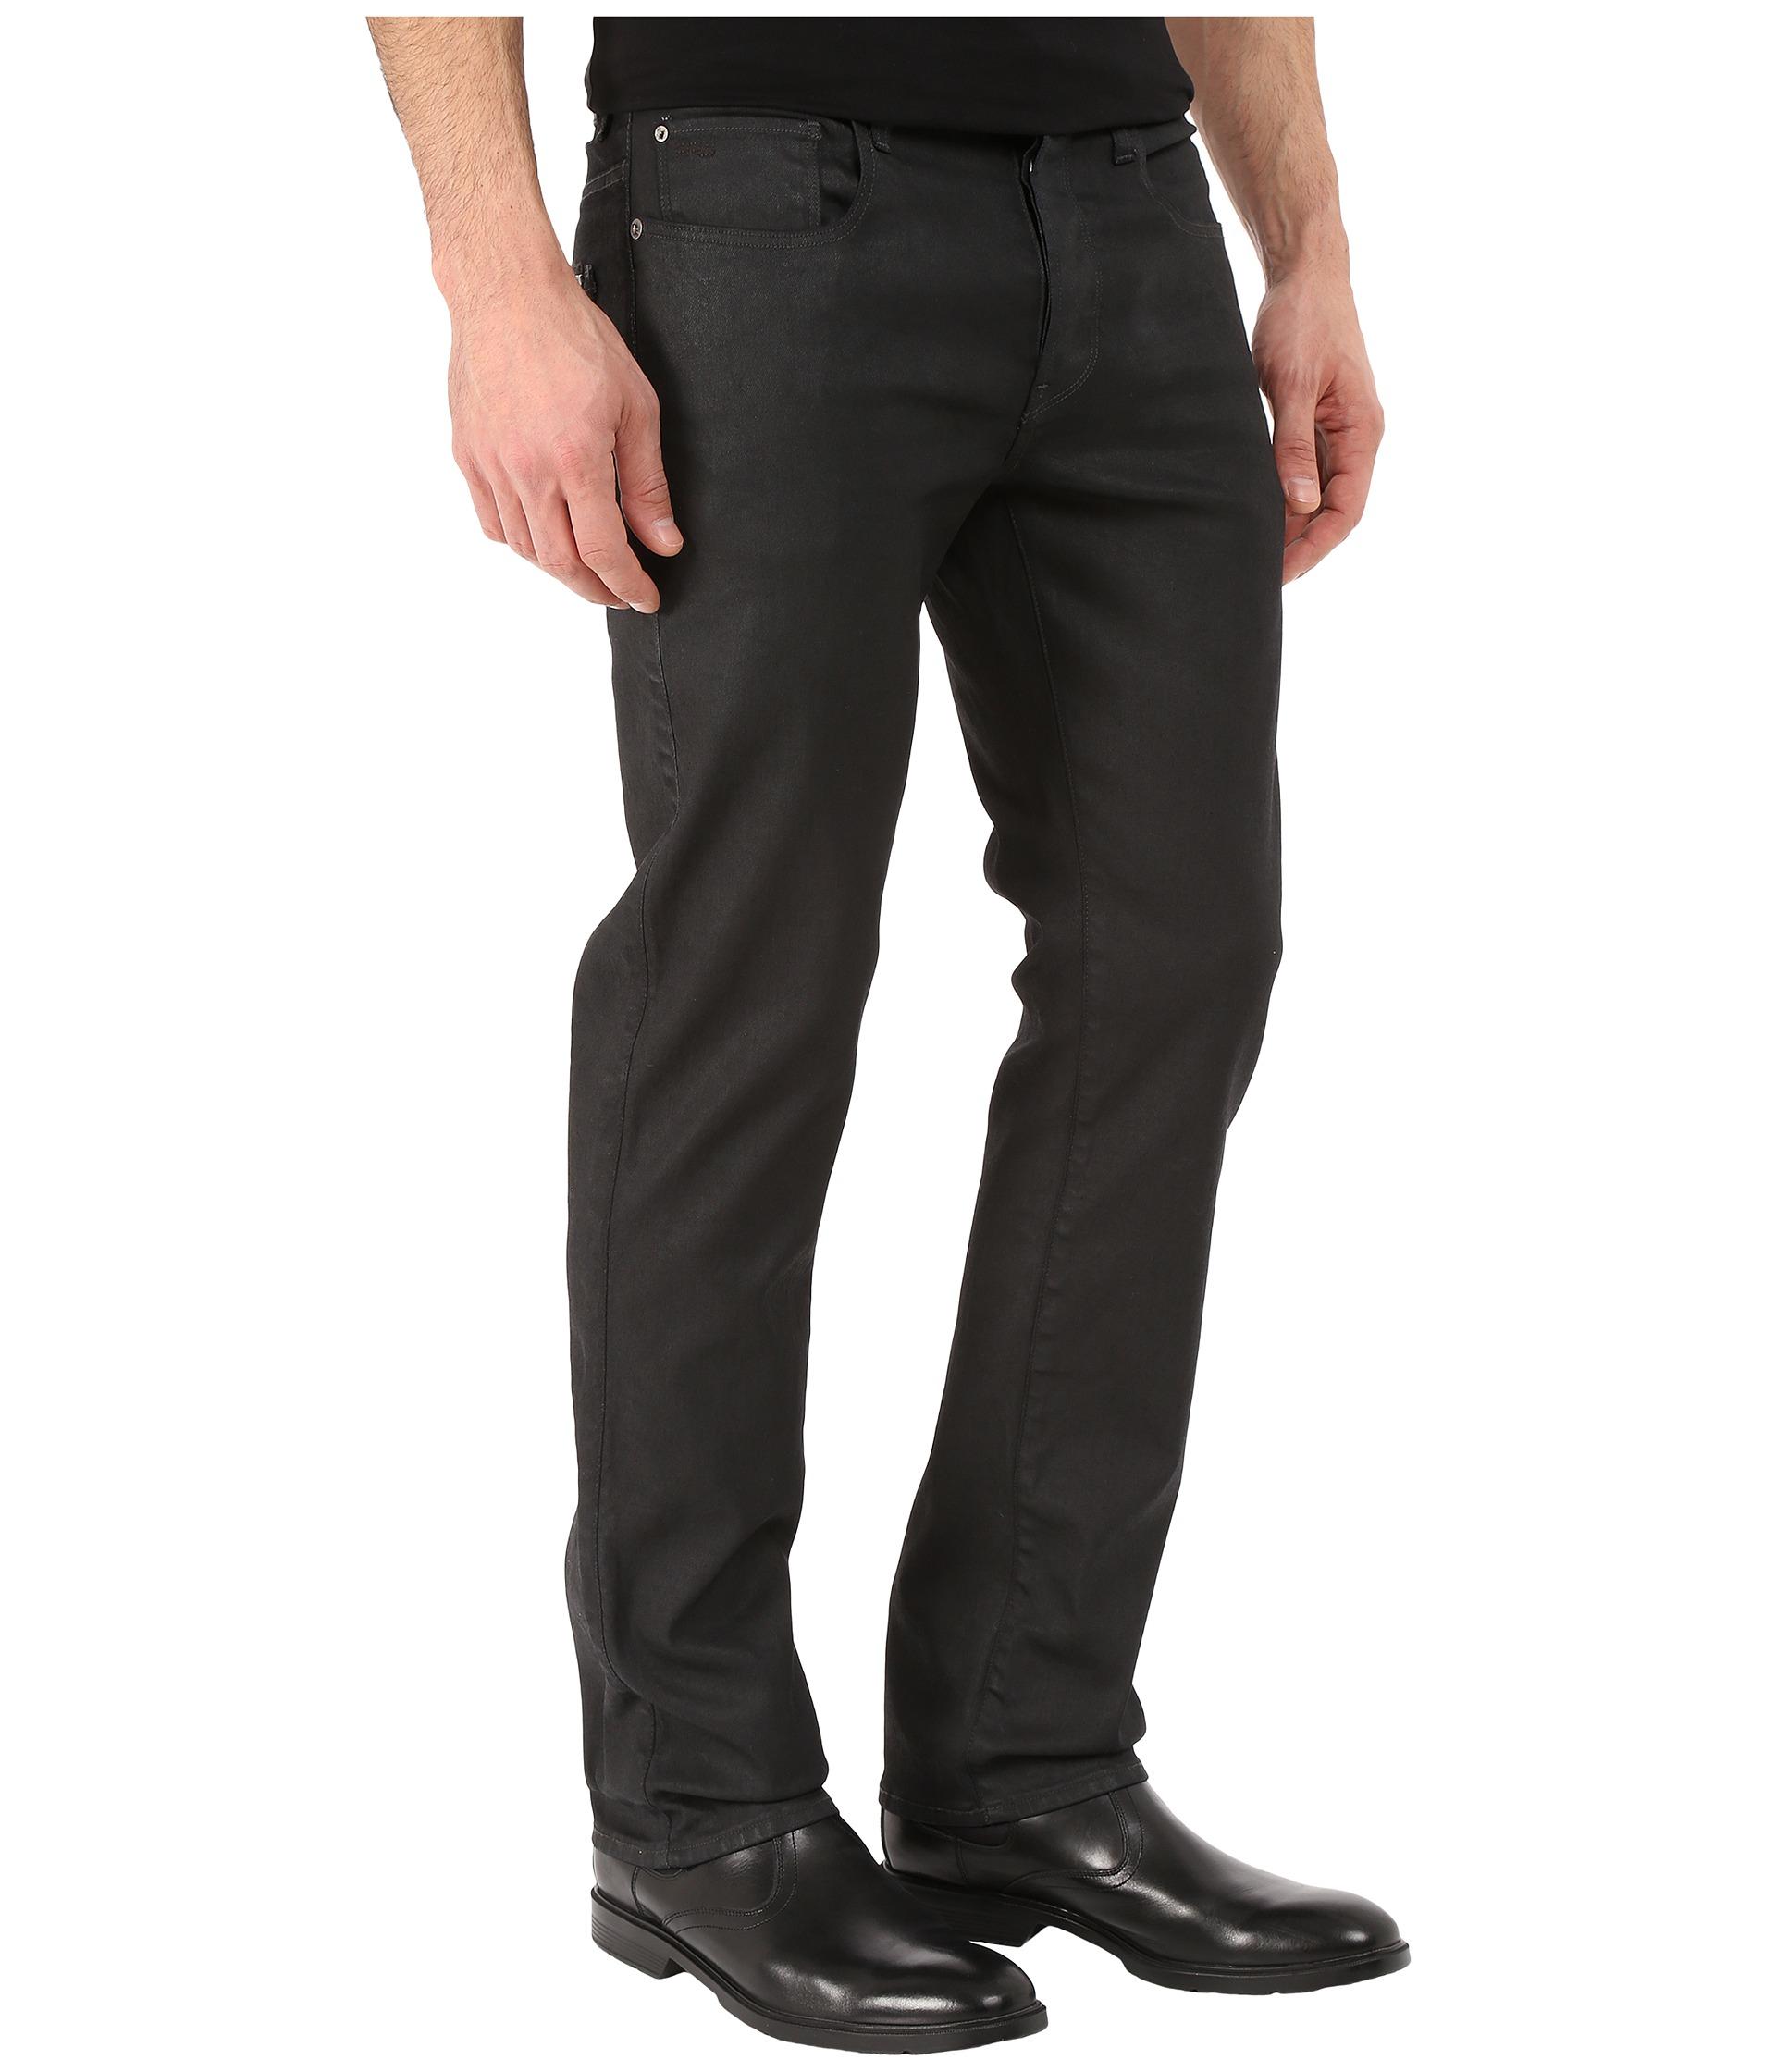 G-star Raw 3301 Straight In Black Pintt Stretch Denim 3d